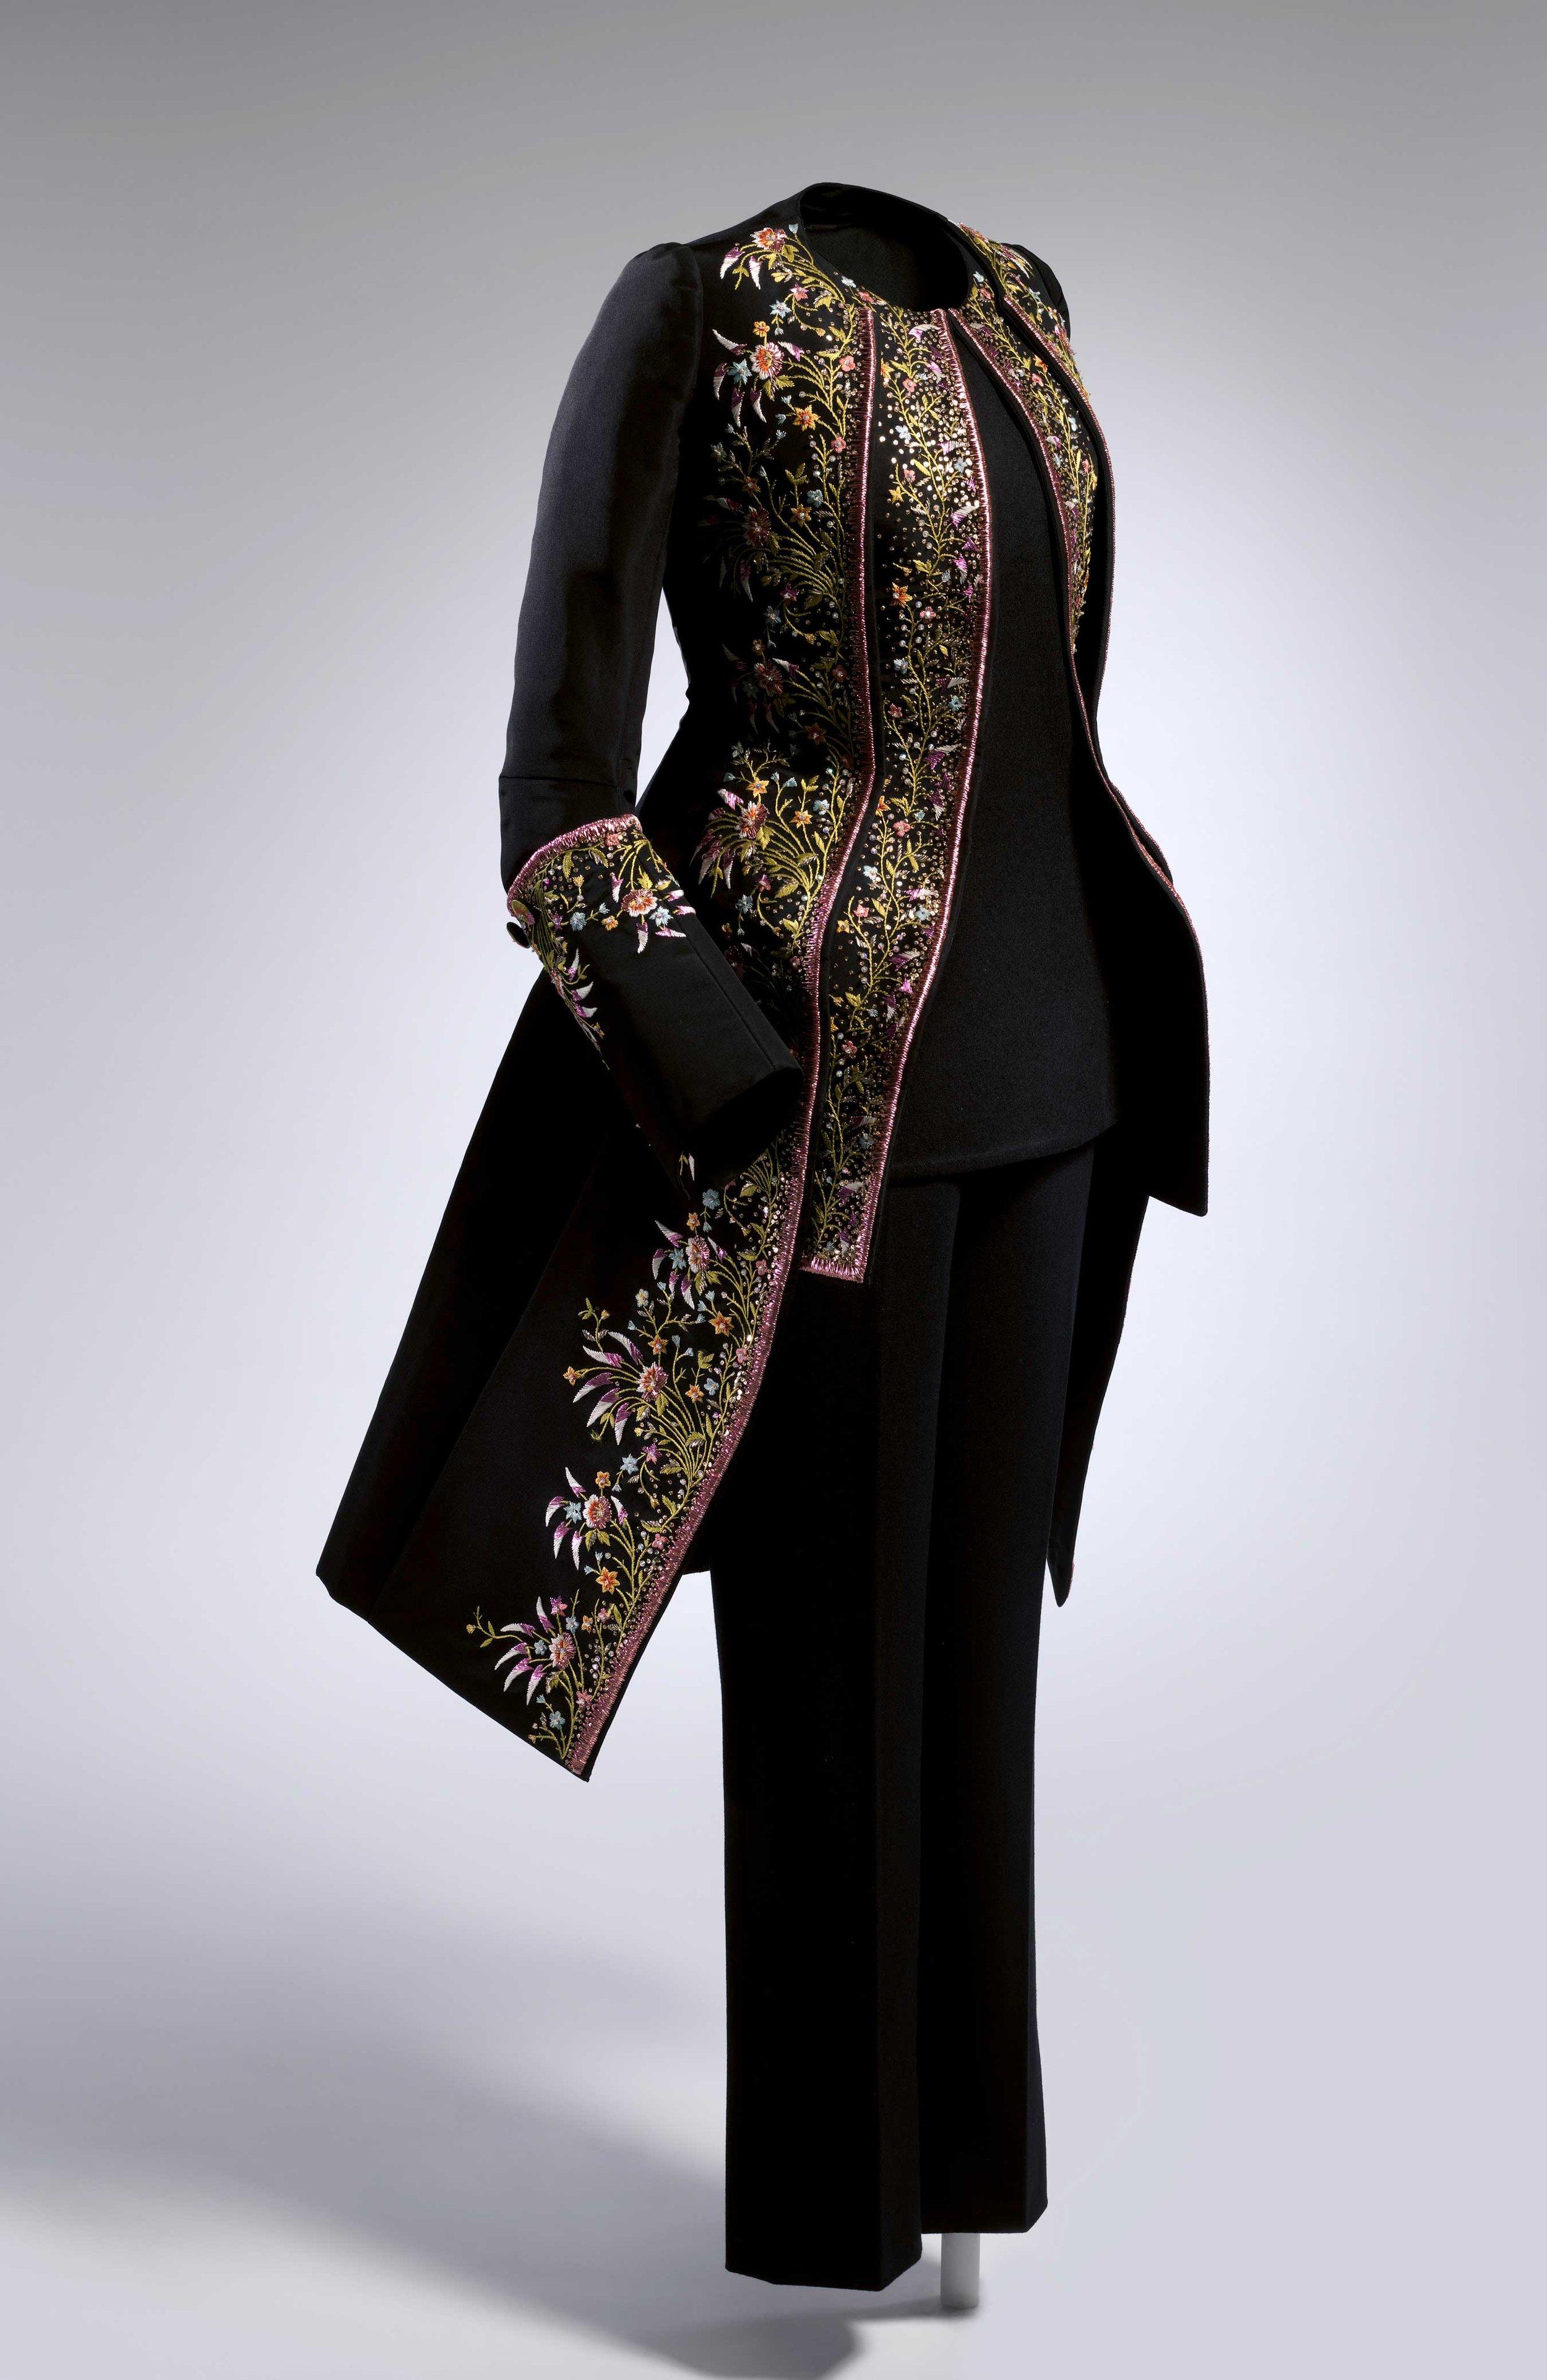 Masterworks: Unpacking Fashion fashion feat. Raf Simons for House of Dior